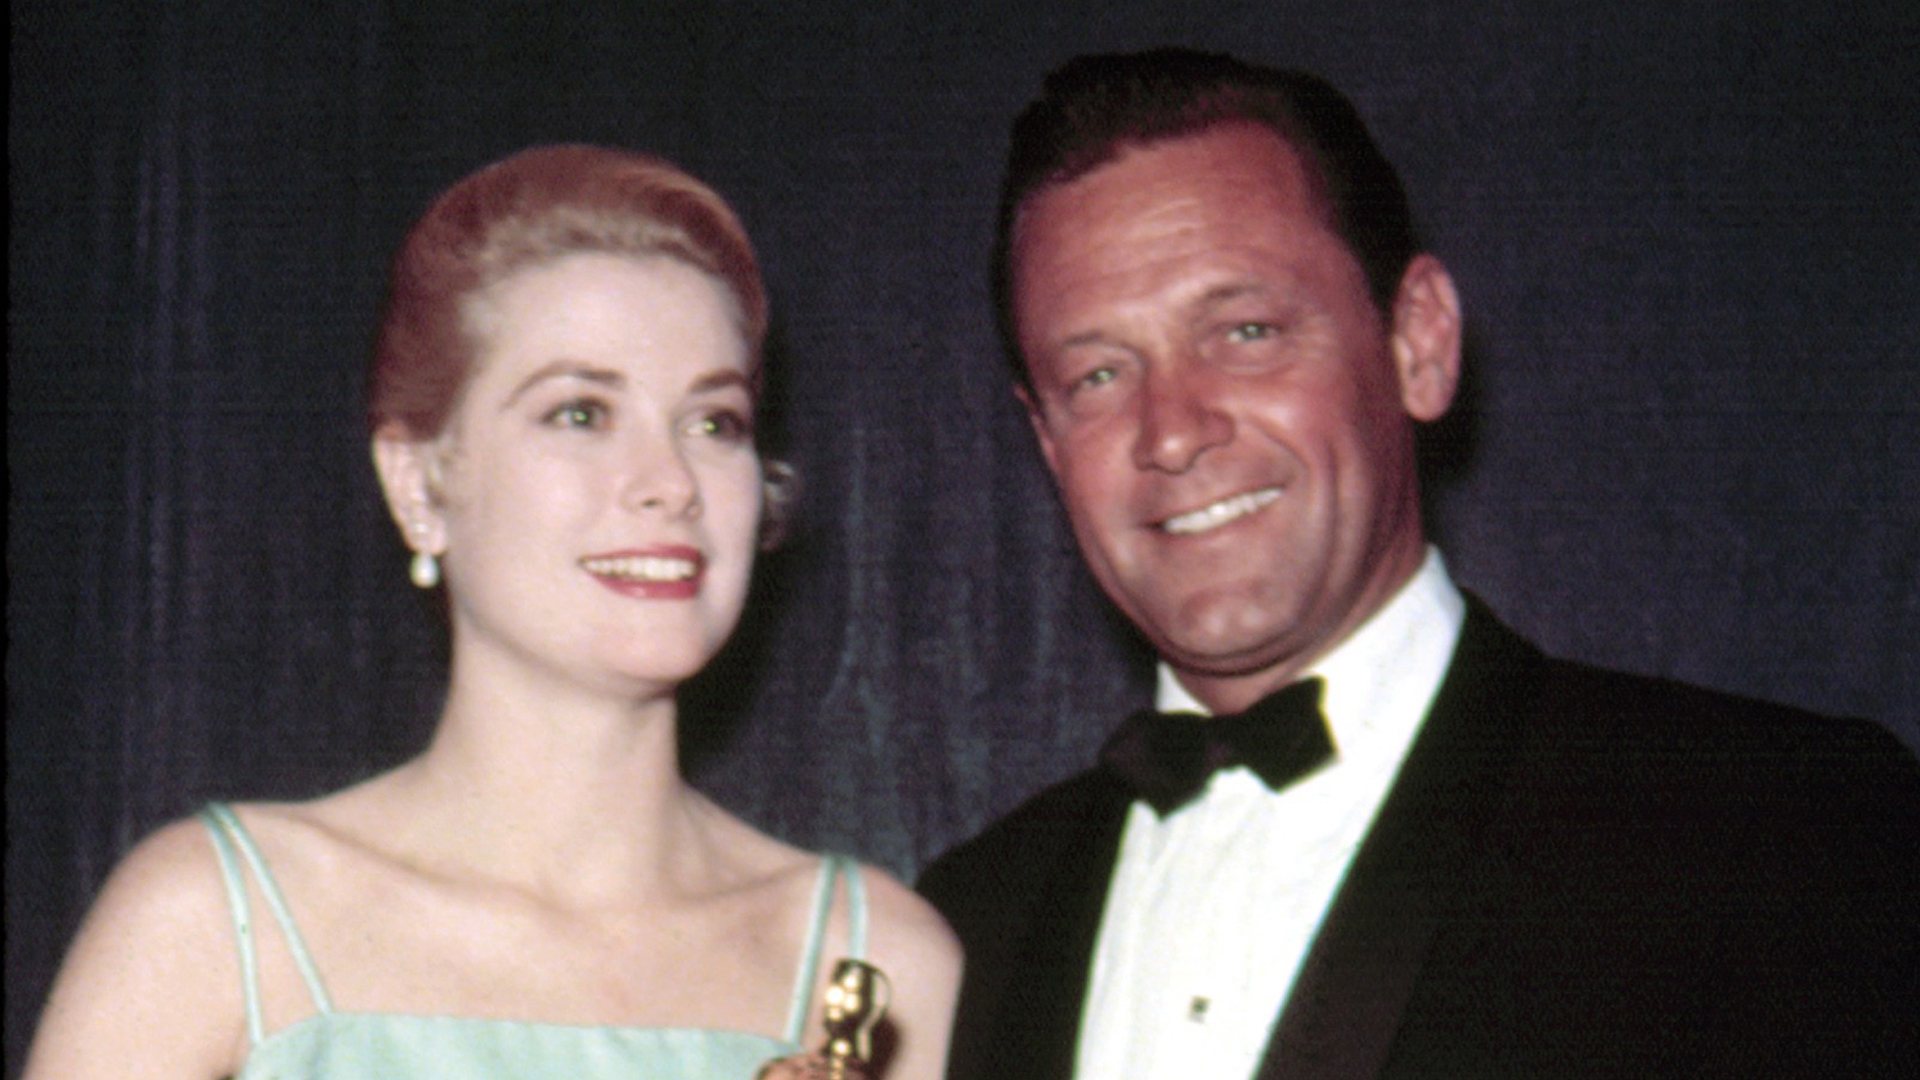 2ebf1d19f5 Complete list of every Oscars best actress winner ever